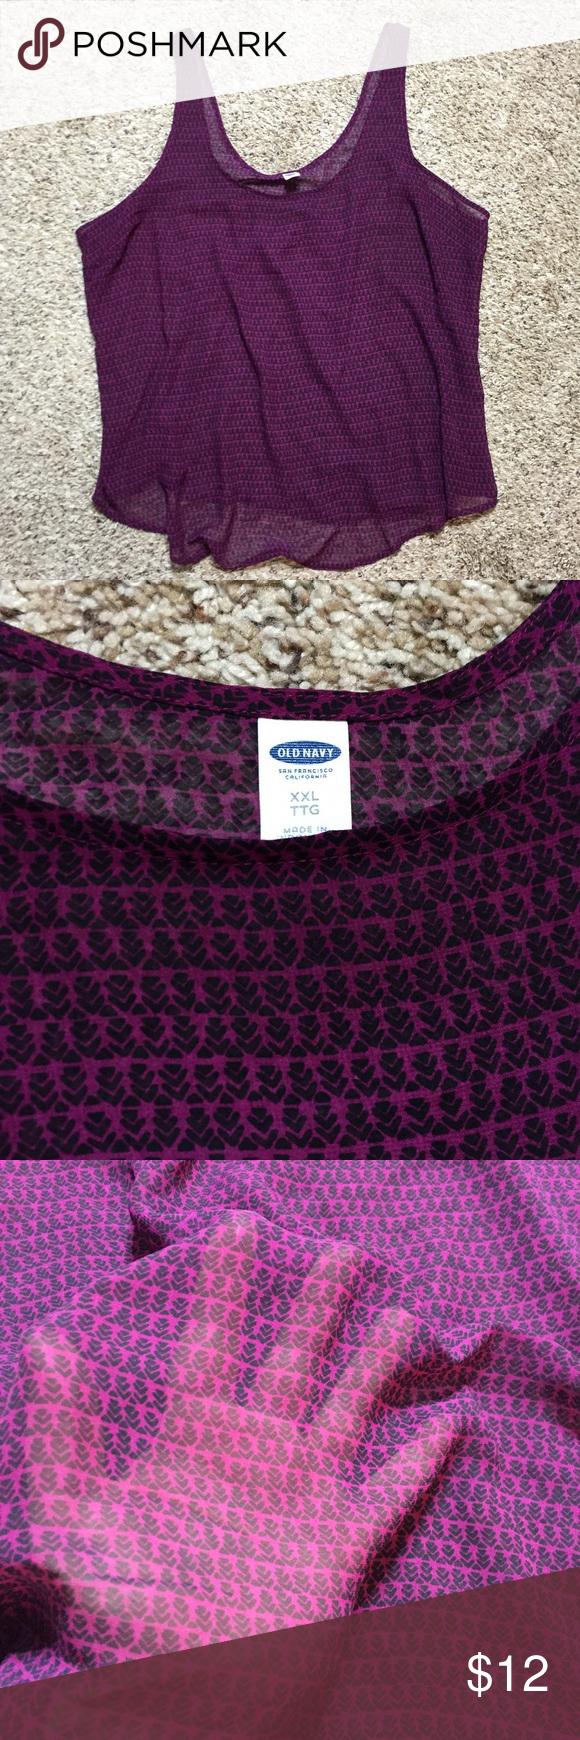 Old Navy sheer chiffon tank top Beautiful purple top with heart print. Sheer chiffon fabric. Old Navy Tops